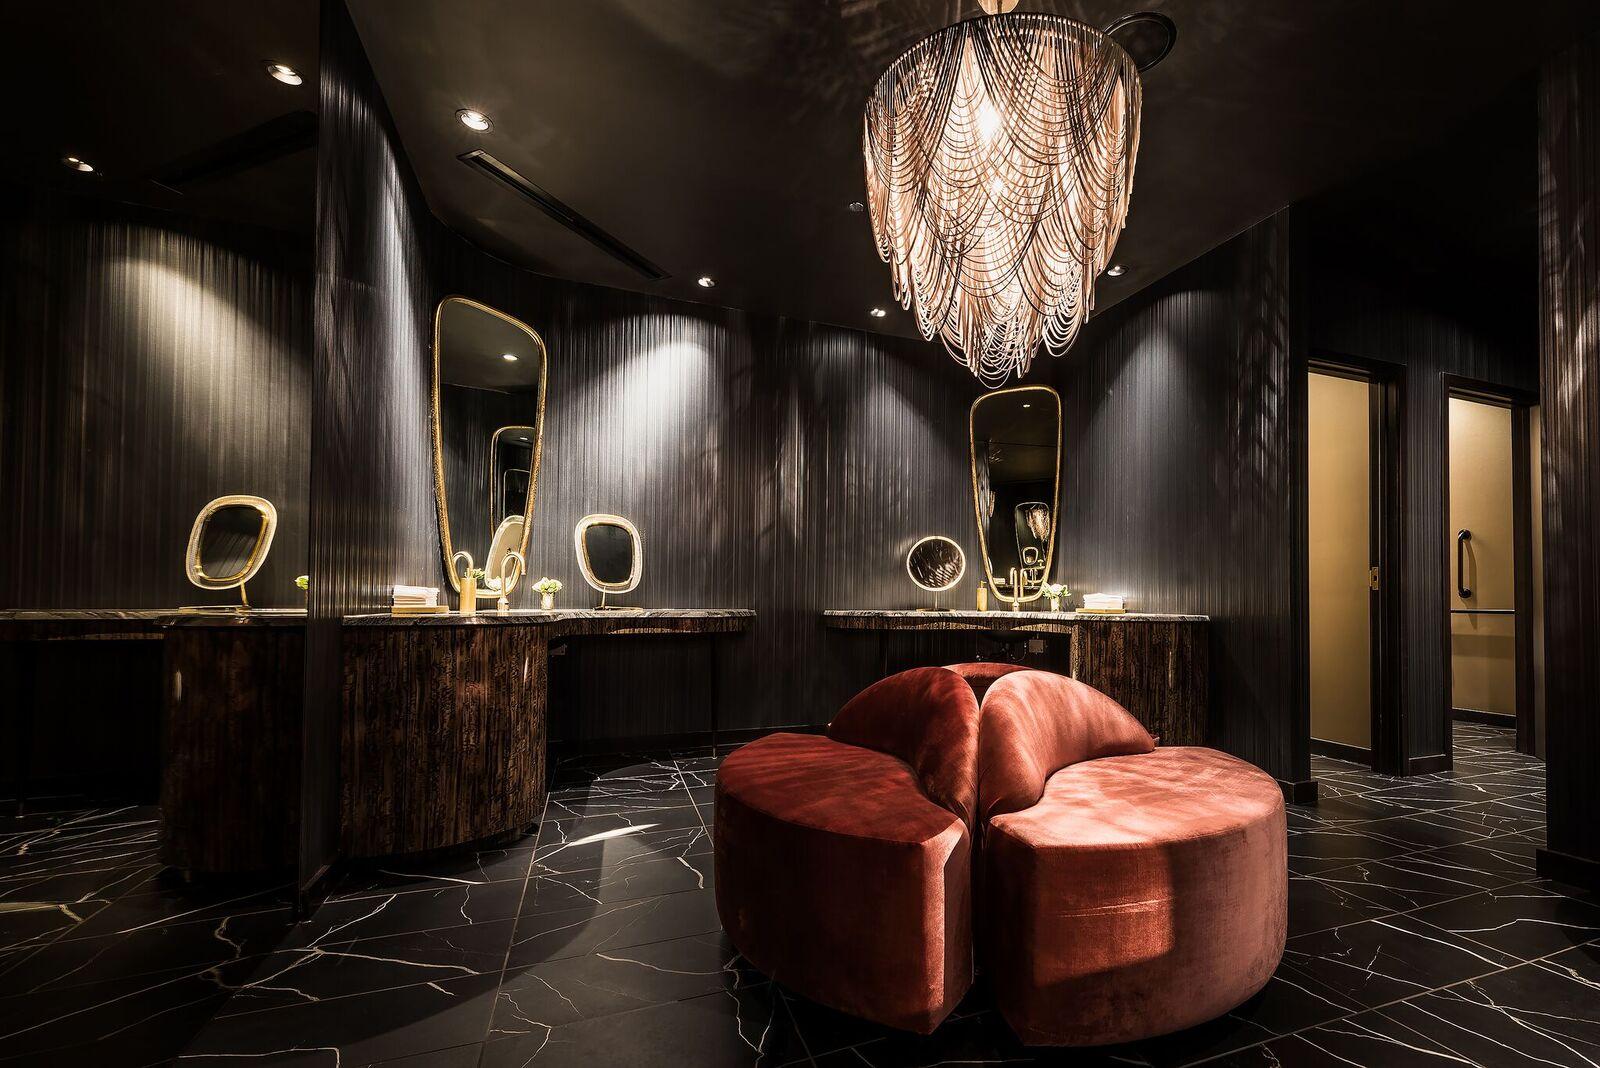 Studio K - BLVD Women's Restroom - Kailley Lindman - BLVD Chicago bathroom - most instagrammed bathroom - karen herold - hollywood dressing rooms - sunset boulevard - most beautiful restaurant bathrooms - most beautiful restaurants - top restaurant designers - top restaurants in chicago